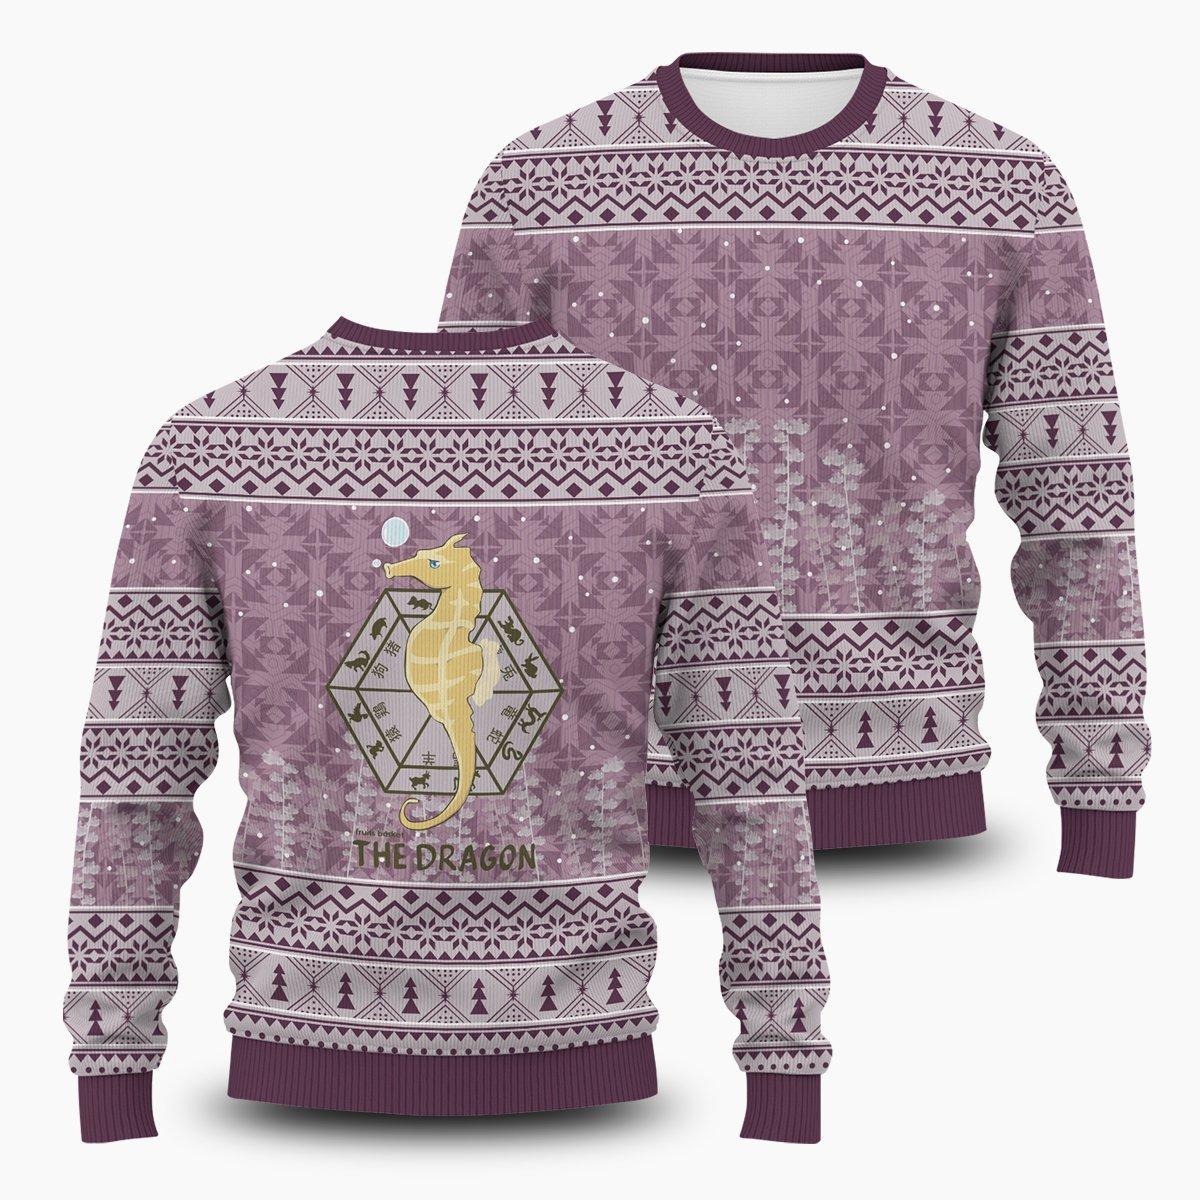 Hatori The Dragon Unisex Wool Sweater FDM0310 S Official Otaku Treat Merch